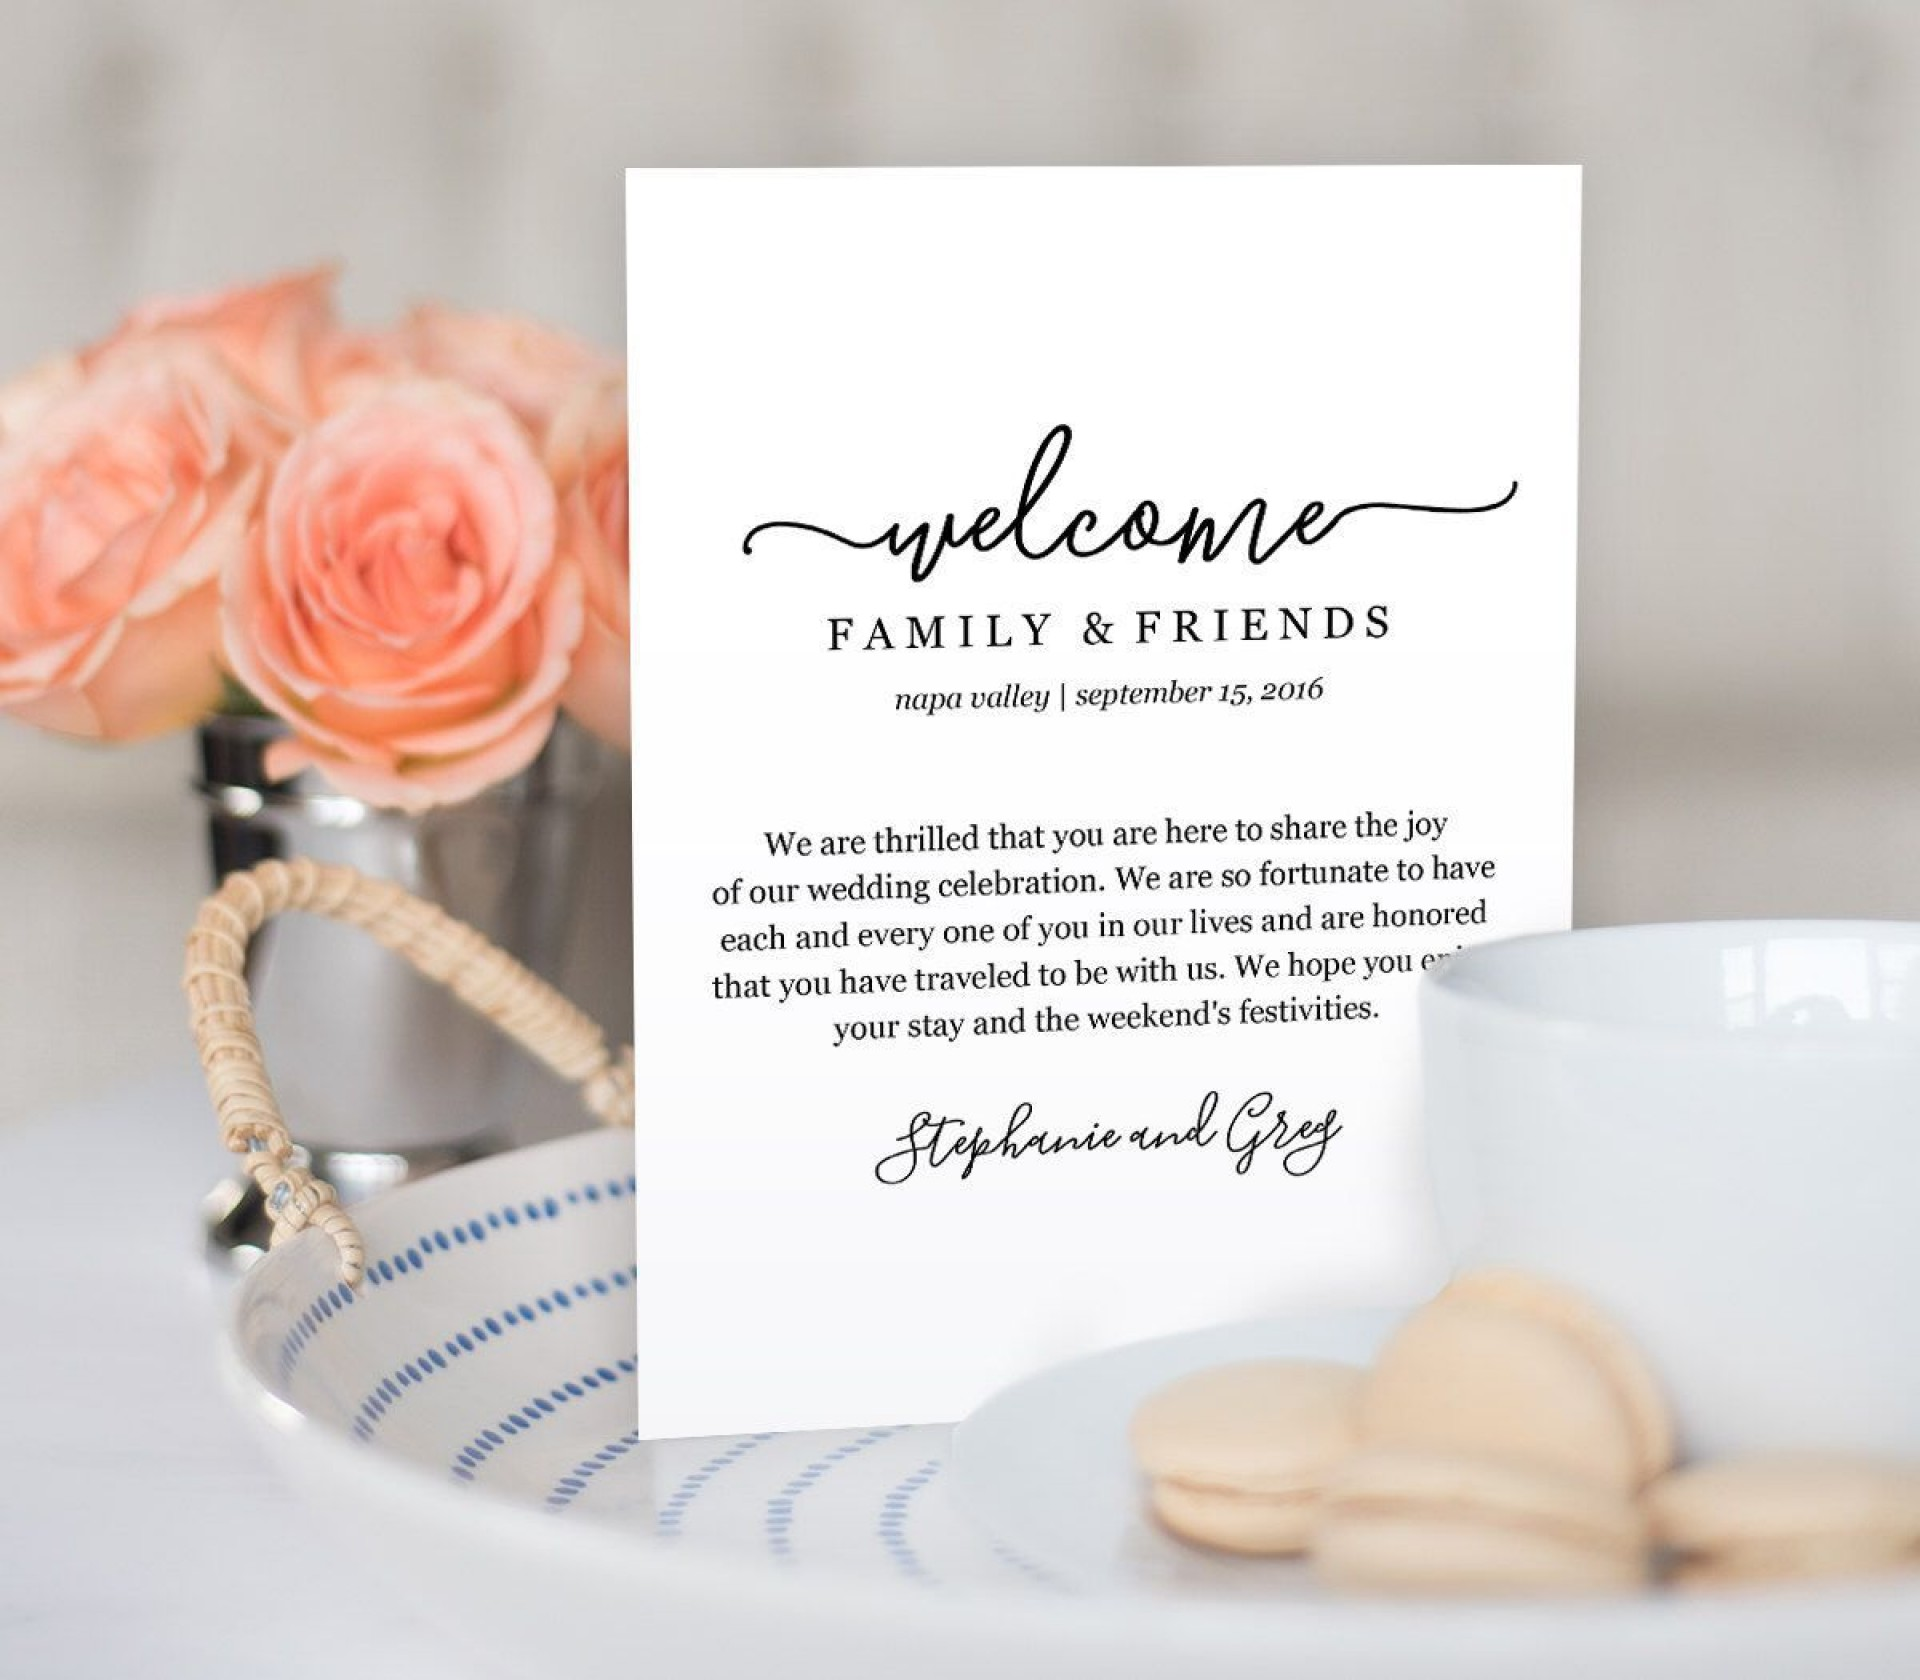 002 Sensational Wedding Welcome Bag Letter Template Free Concept 1920